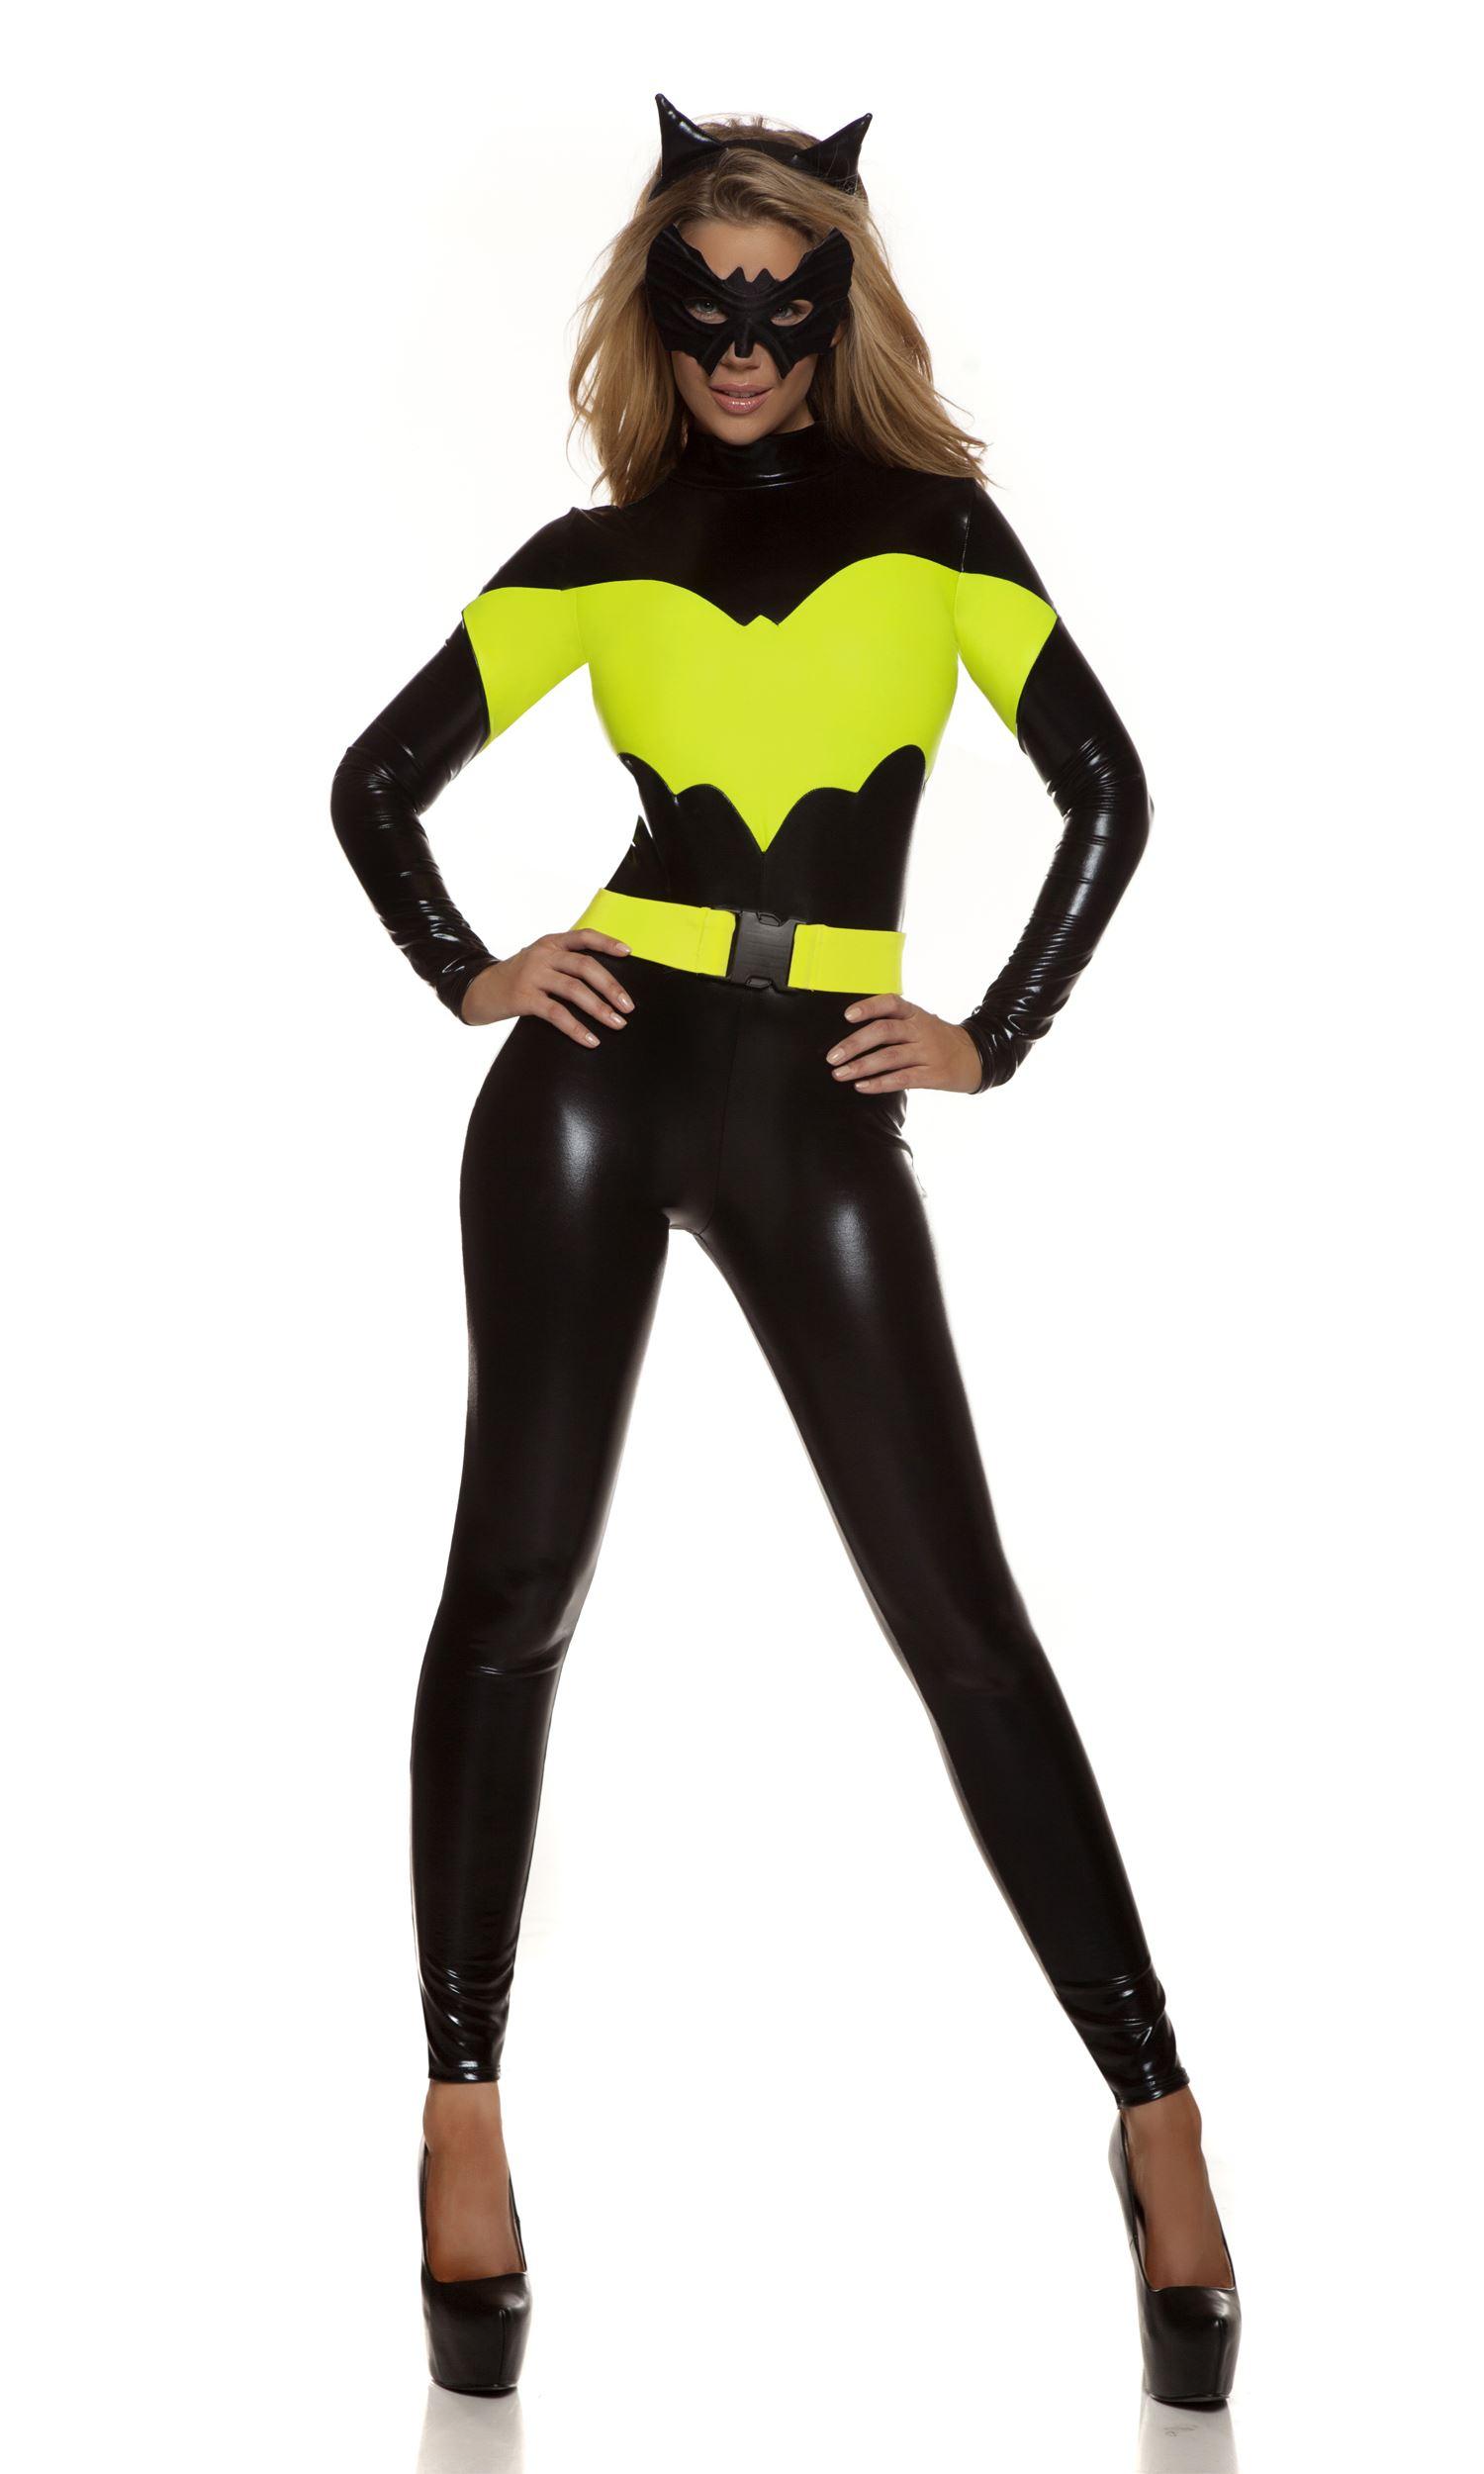 Adult Darque Nights Sexy Superhero Women Costume | $74.99 ...